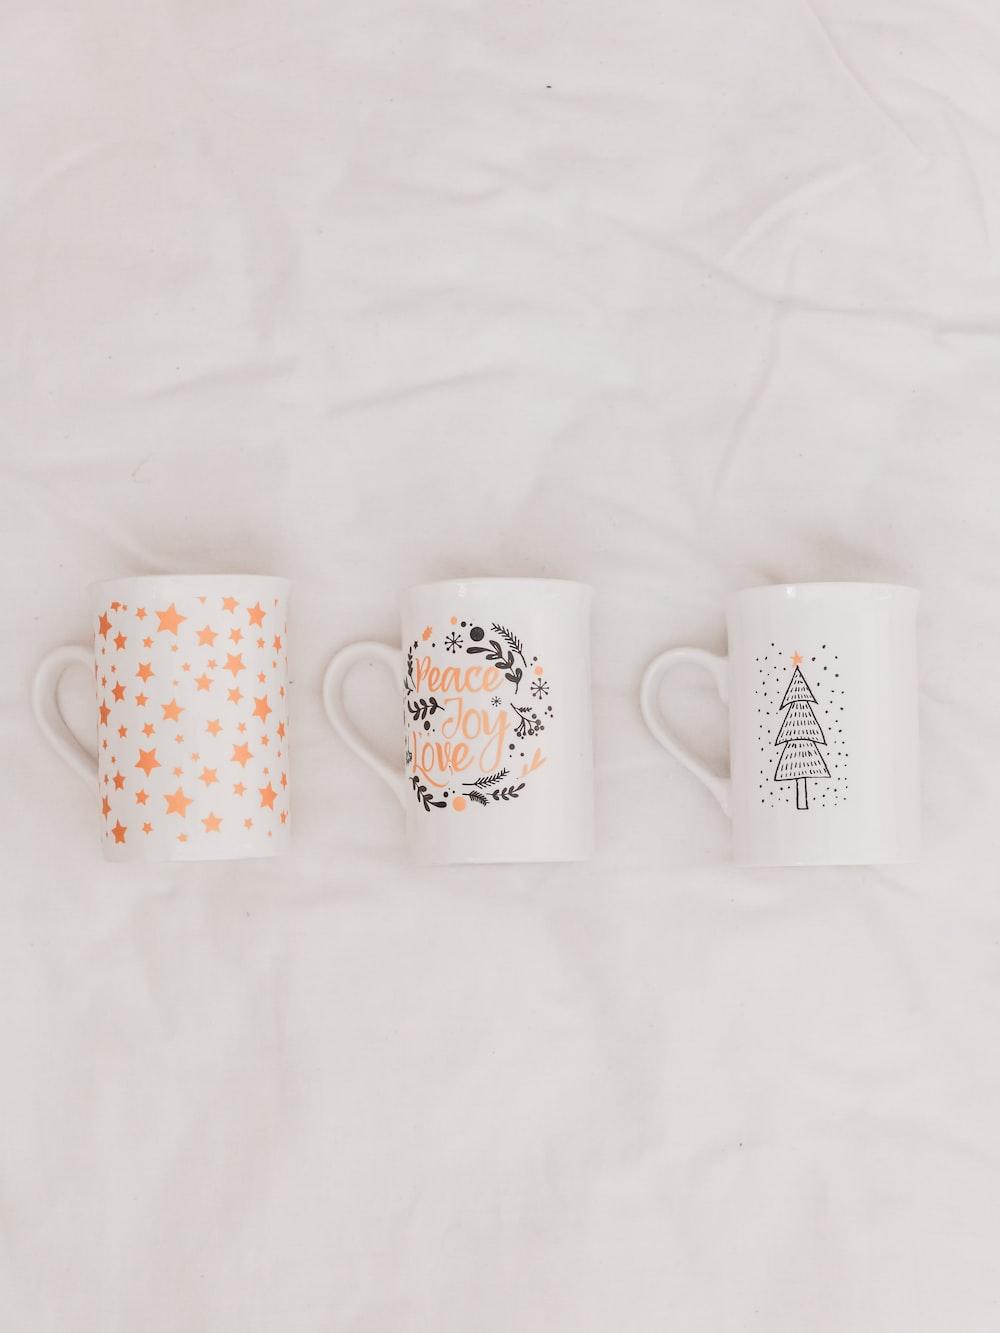 three white-and-multicolored ceramic mugs on white textile